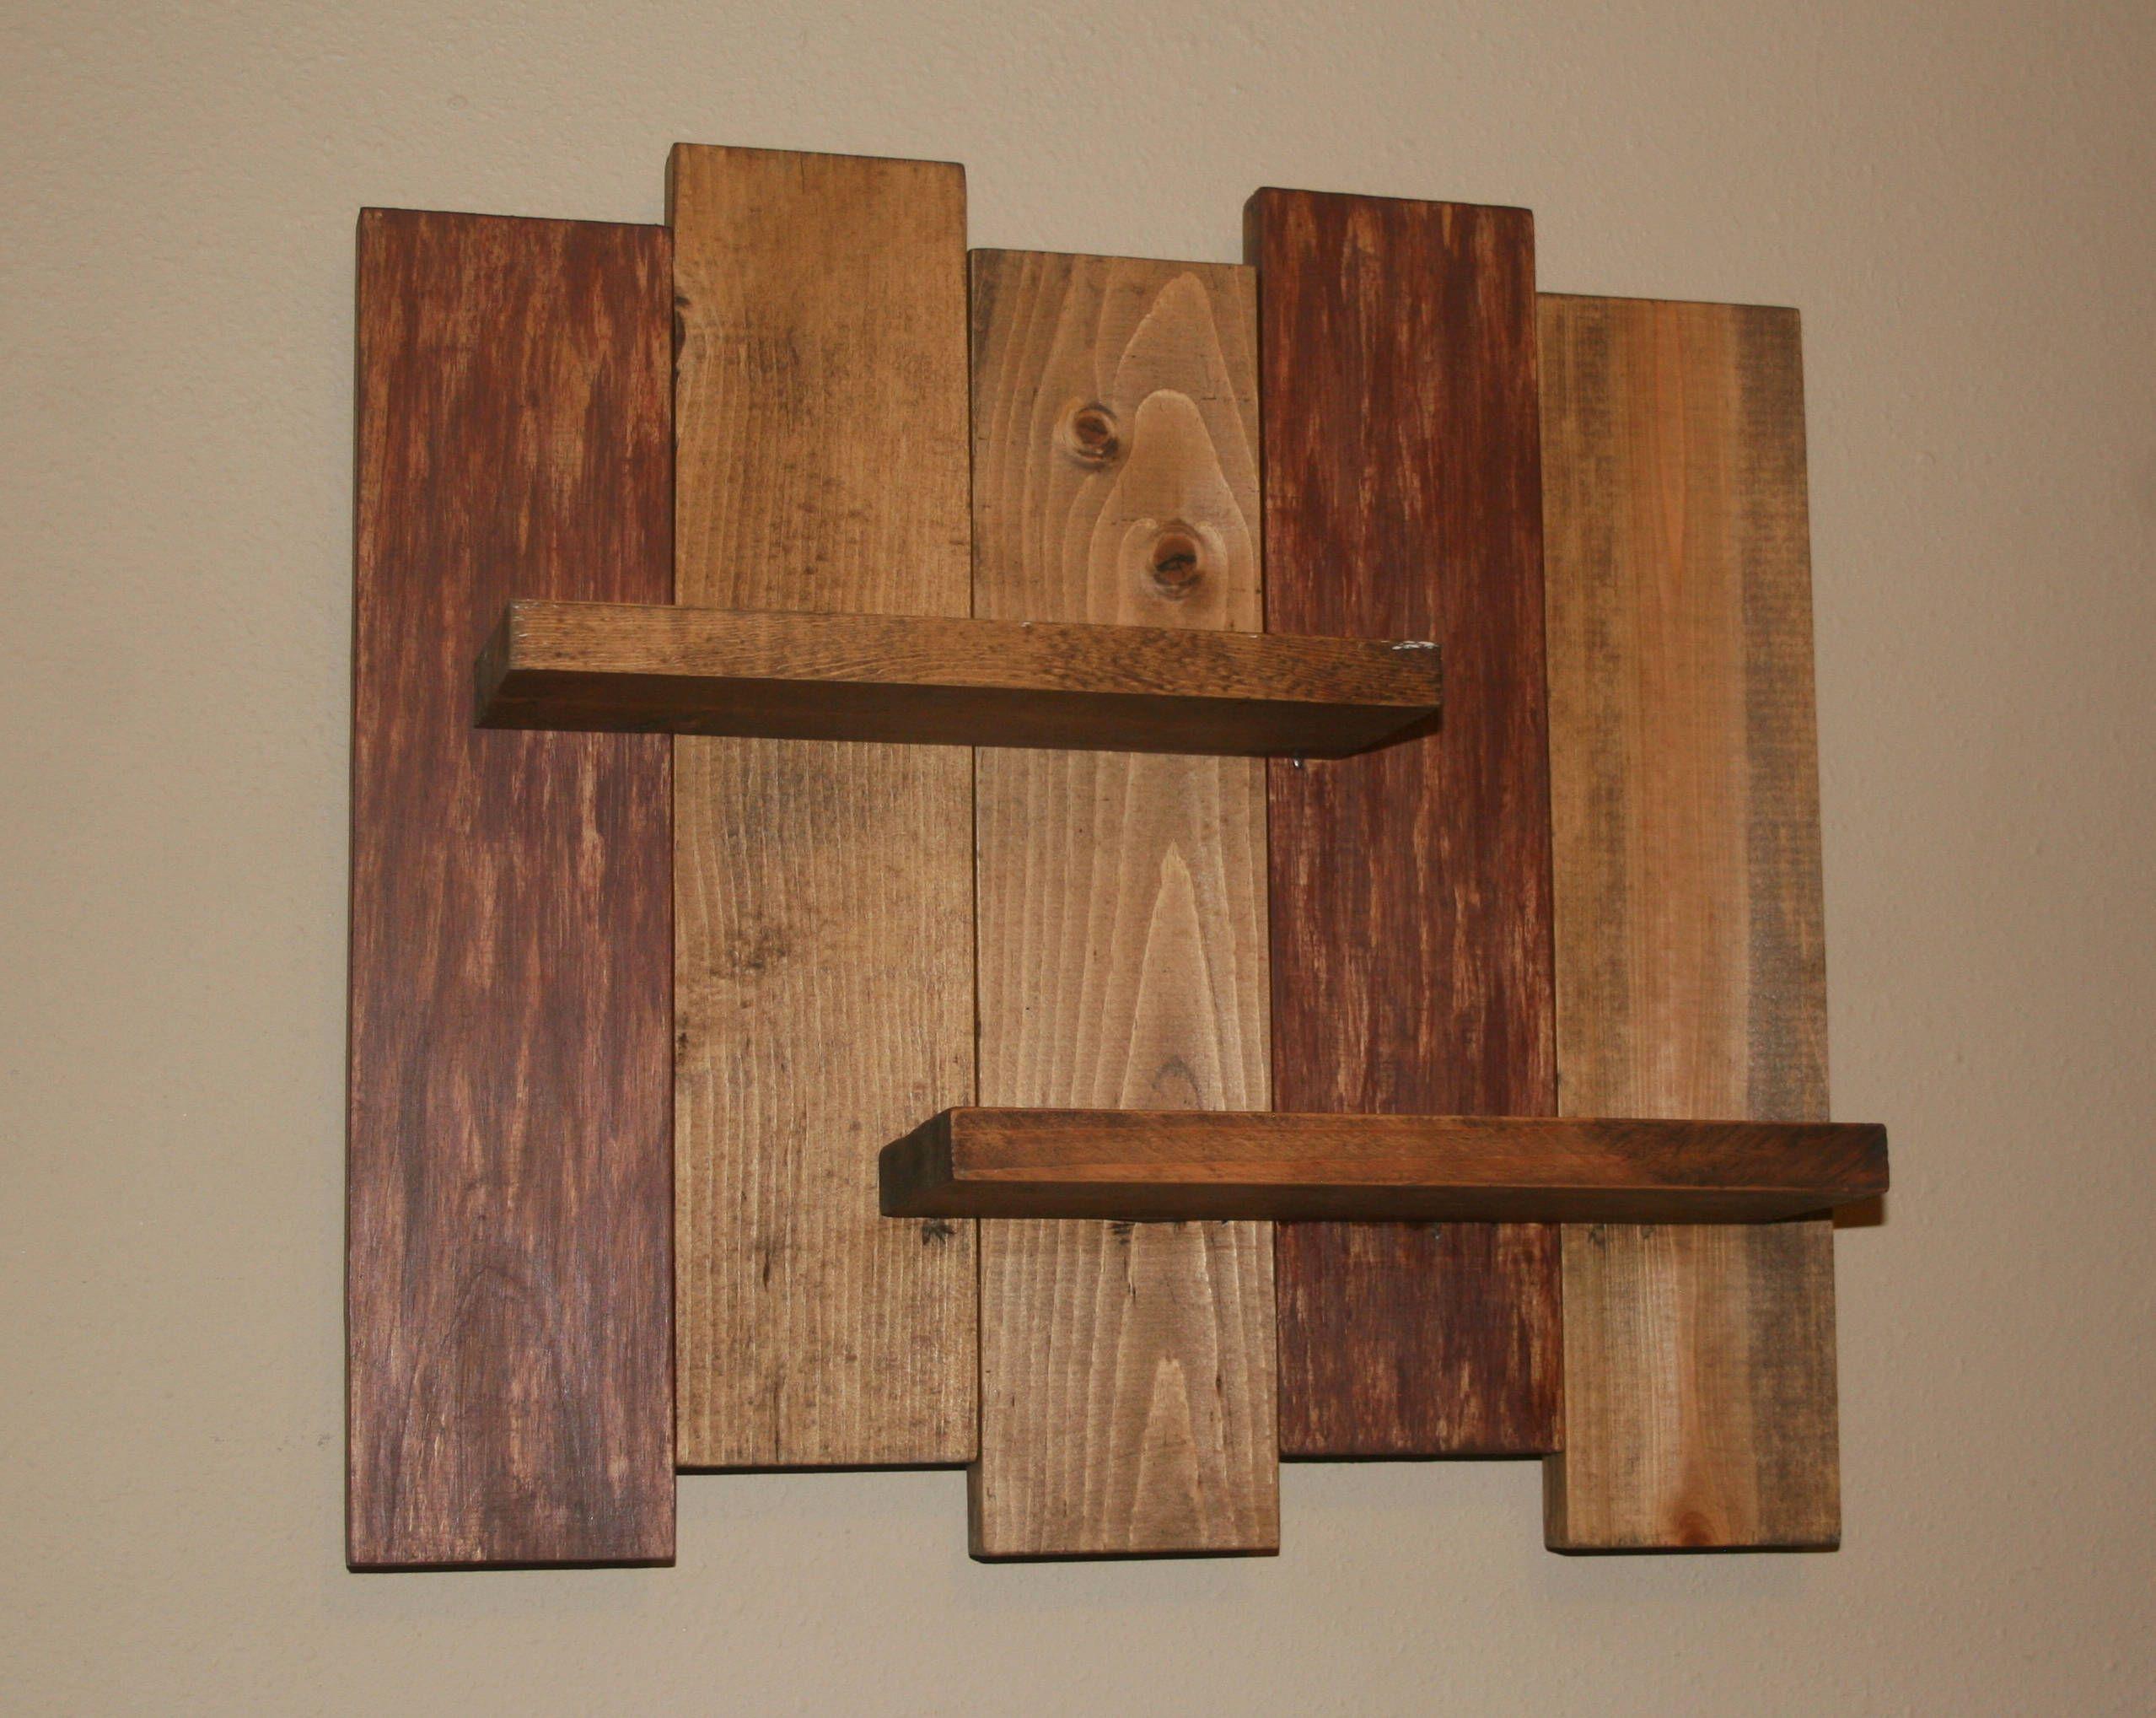 Rustic Wood Wall Shelf Reclaimed Wood Shelf Distressed Pallet Wood Primitive Home Decor W Wood Wall Decor Diy Rustic Wood Wall Decor Wood Wall Art Decor